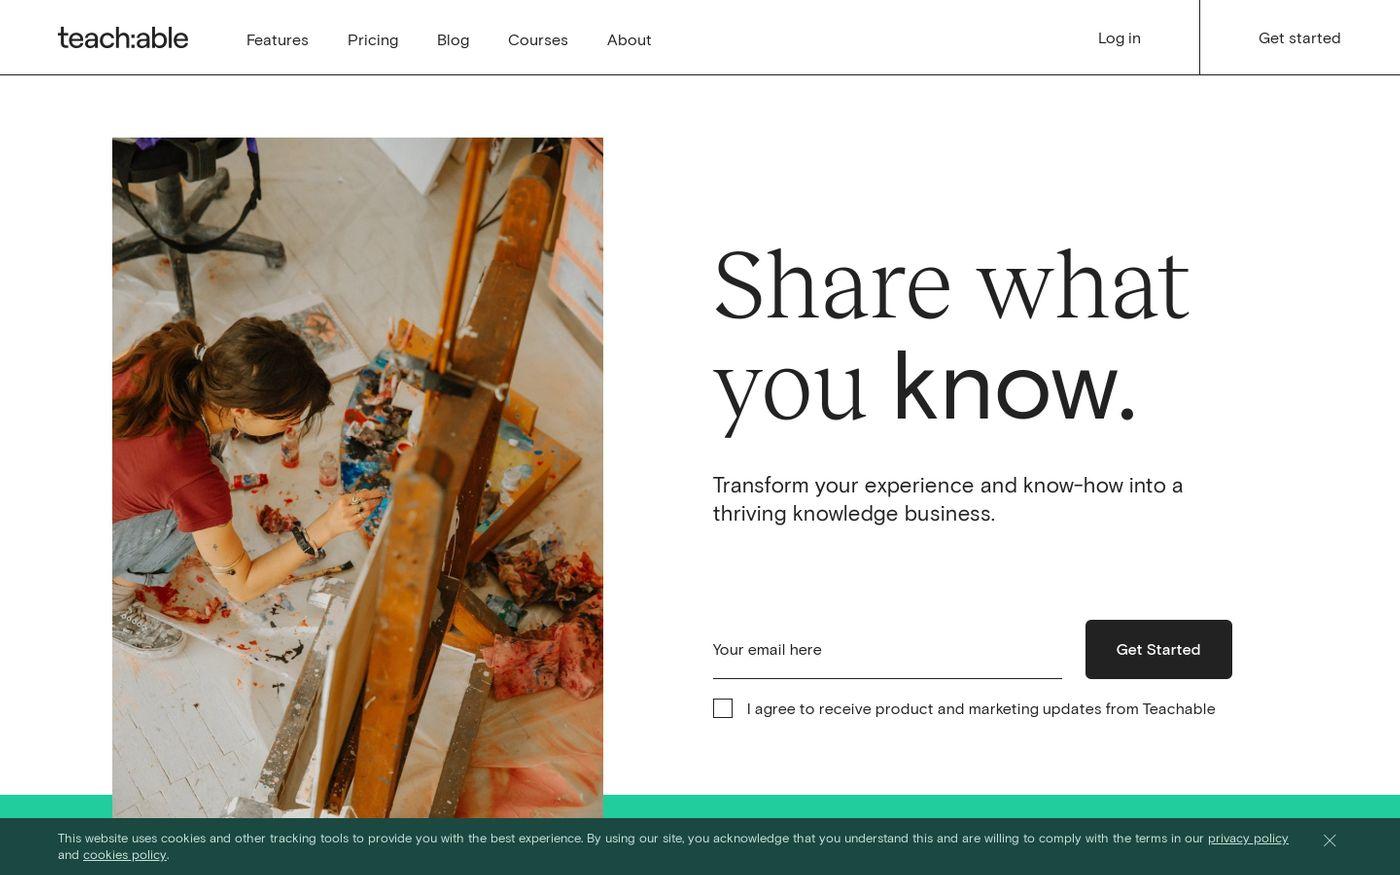 Screenshot of Teachable website